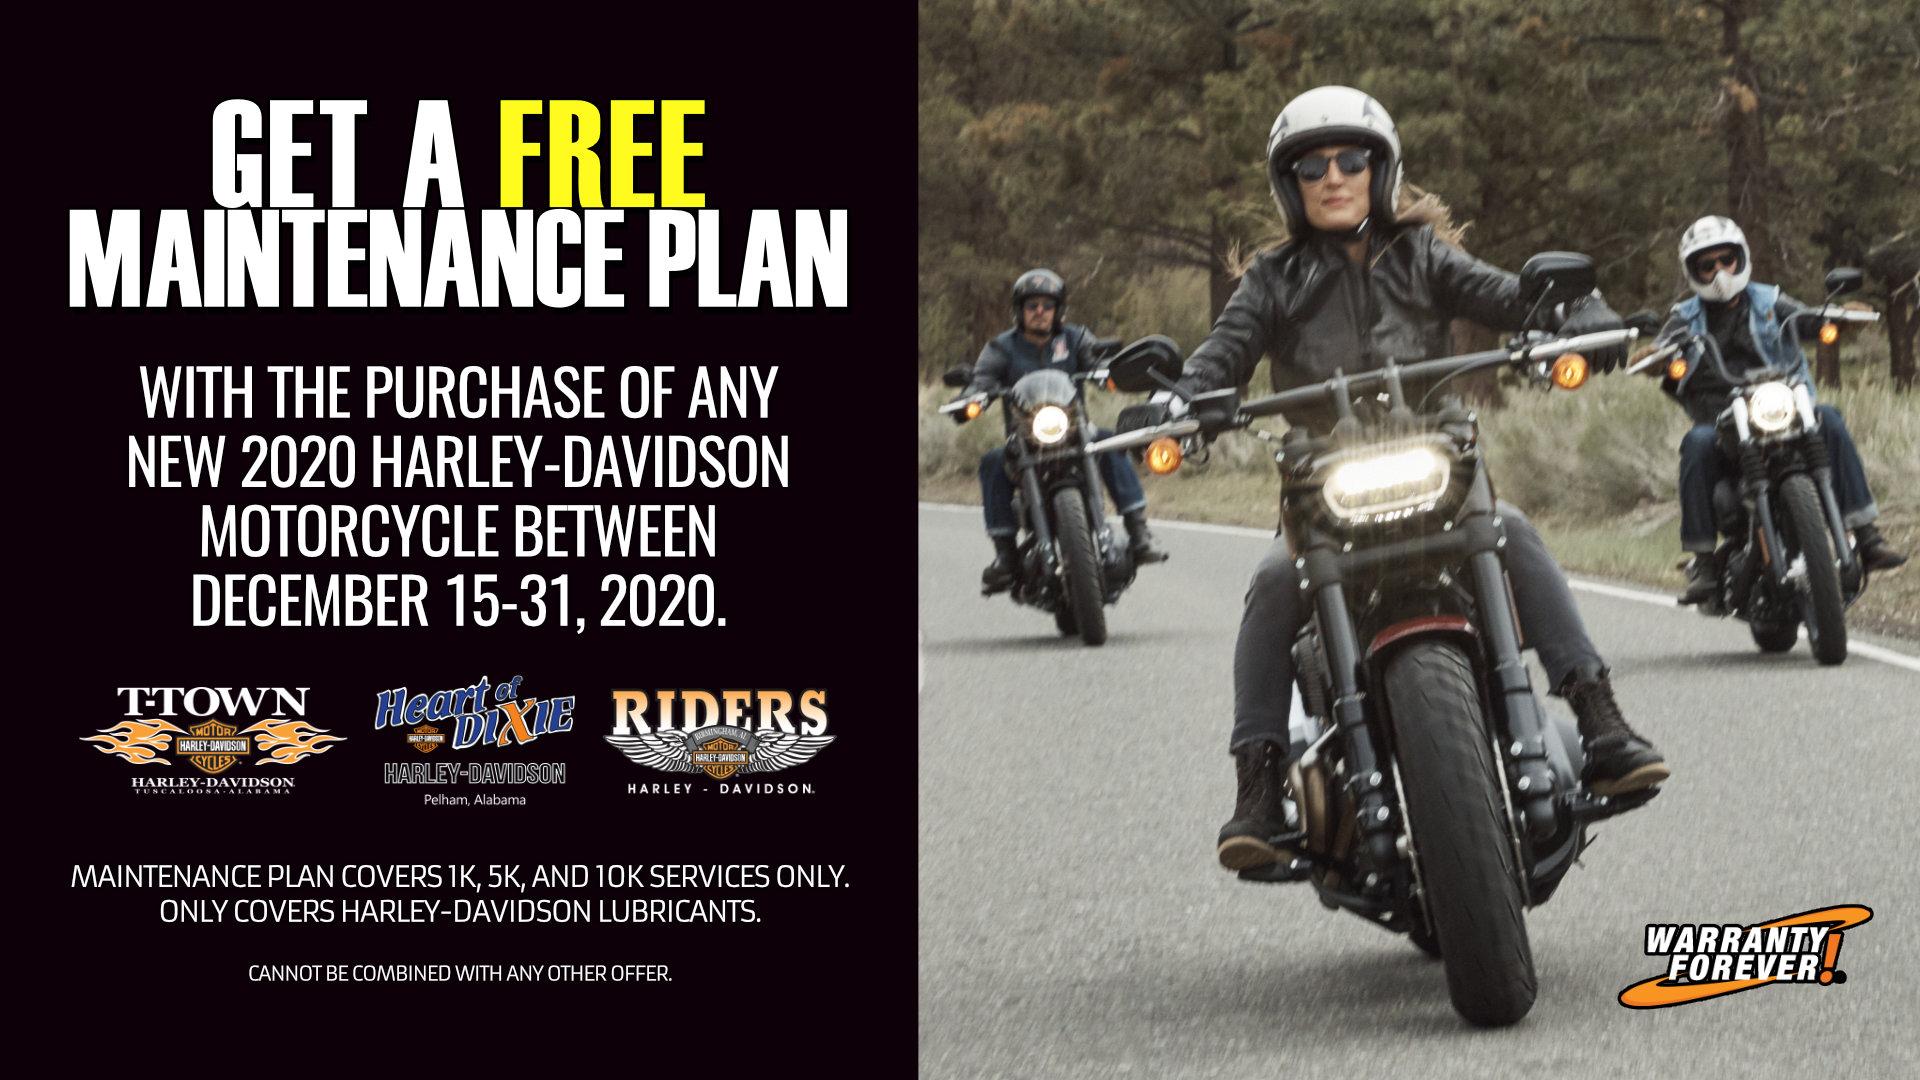 Free Maintenance Plan Offer at Heart of Dixie Harley-Davidson, Riders Harley-Davidson, & T-Town Harley-Davidson